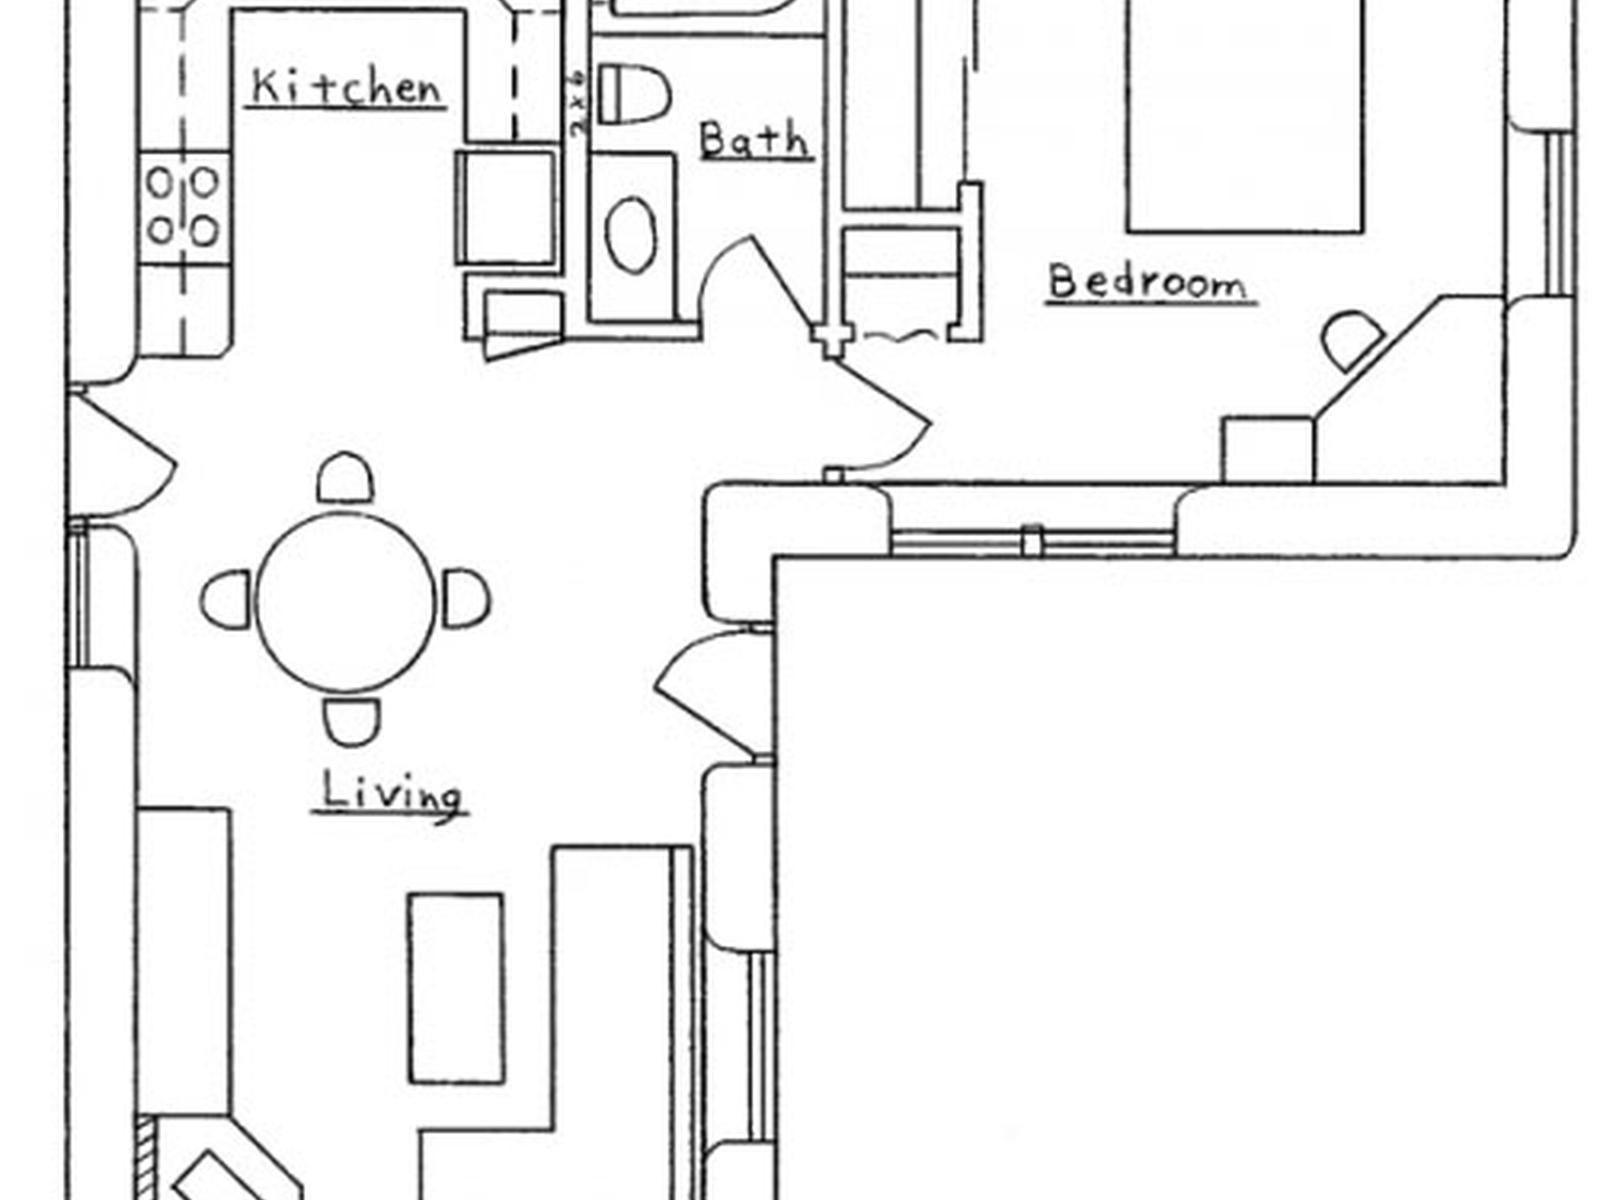 Furniture Plan View Building Pallet Shelves Deremer Co H Shaped House Plans Australia H Shaped Ho Tiny House Floor Plans Small House Floor Plans L Shaped House